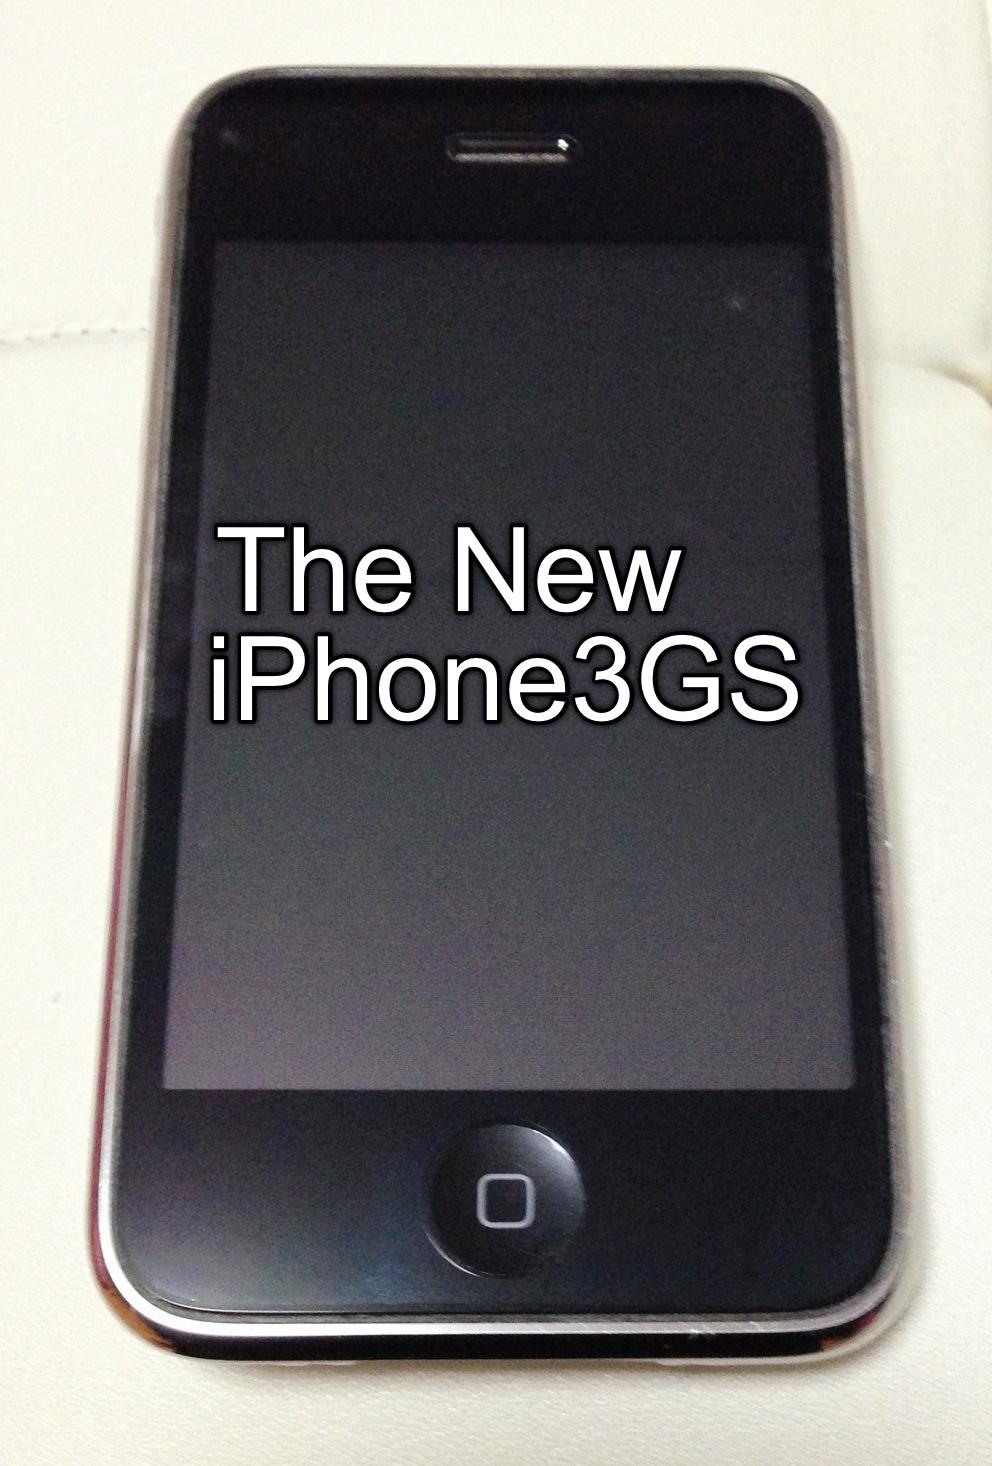 iphone 3GS 에게 새 생명을 ...